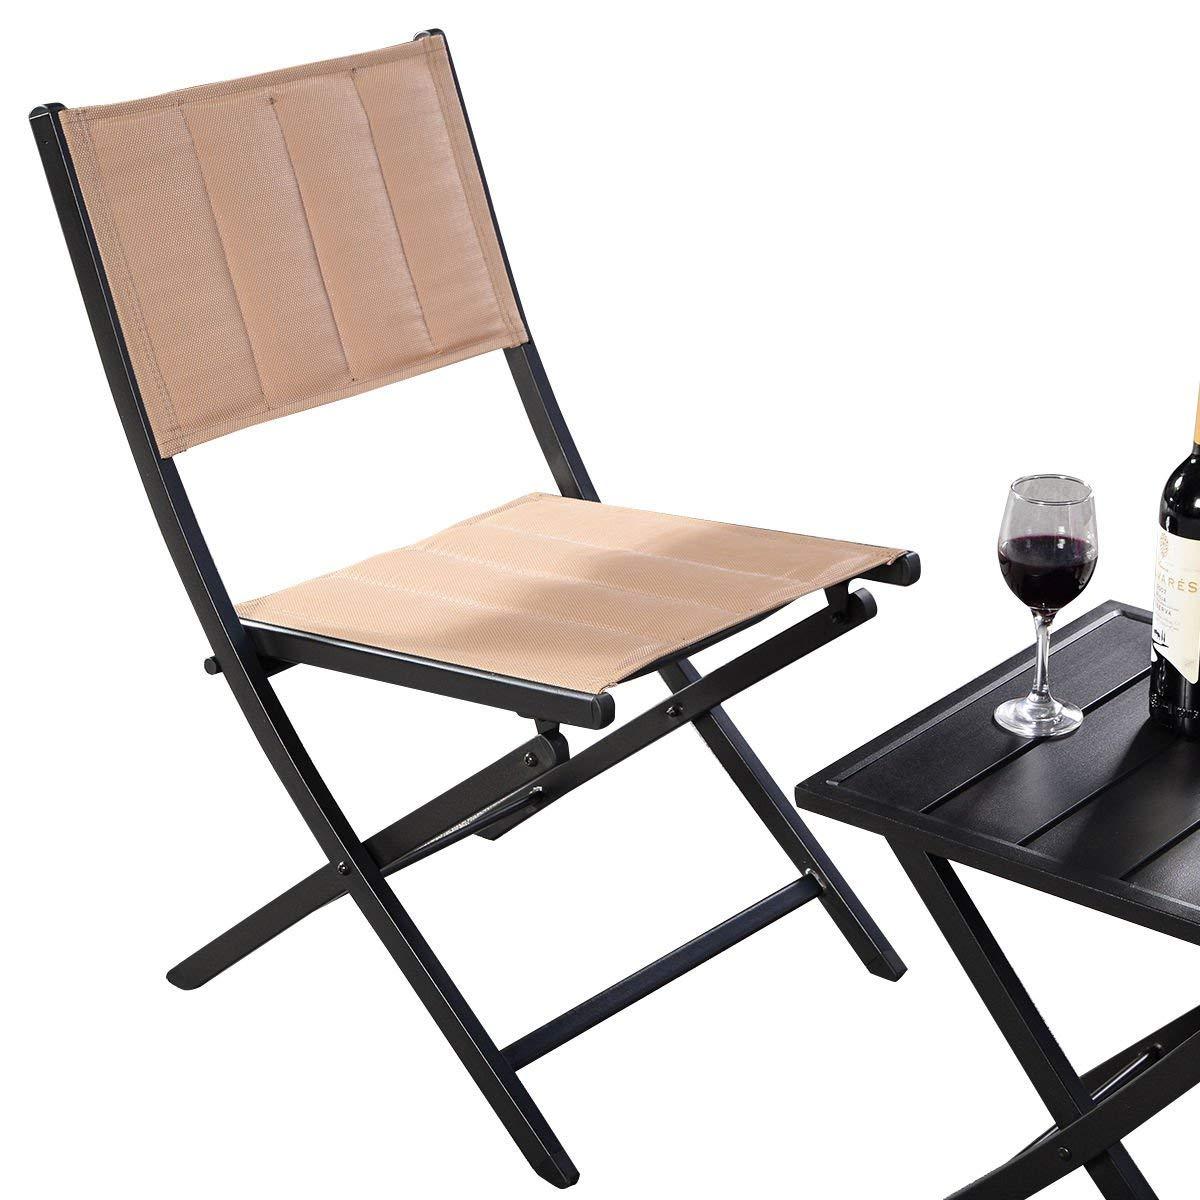 KCHEX>3PCS Furniture Outdoor Patio Folding Square Table Chairs Set Bistro Garden>Our 3 Pieces Table and Chairs Set. It Has One Folding Table with 2 Chairs.